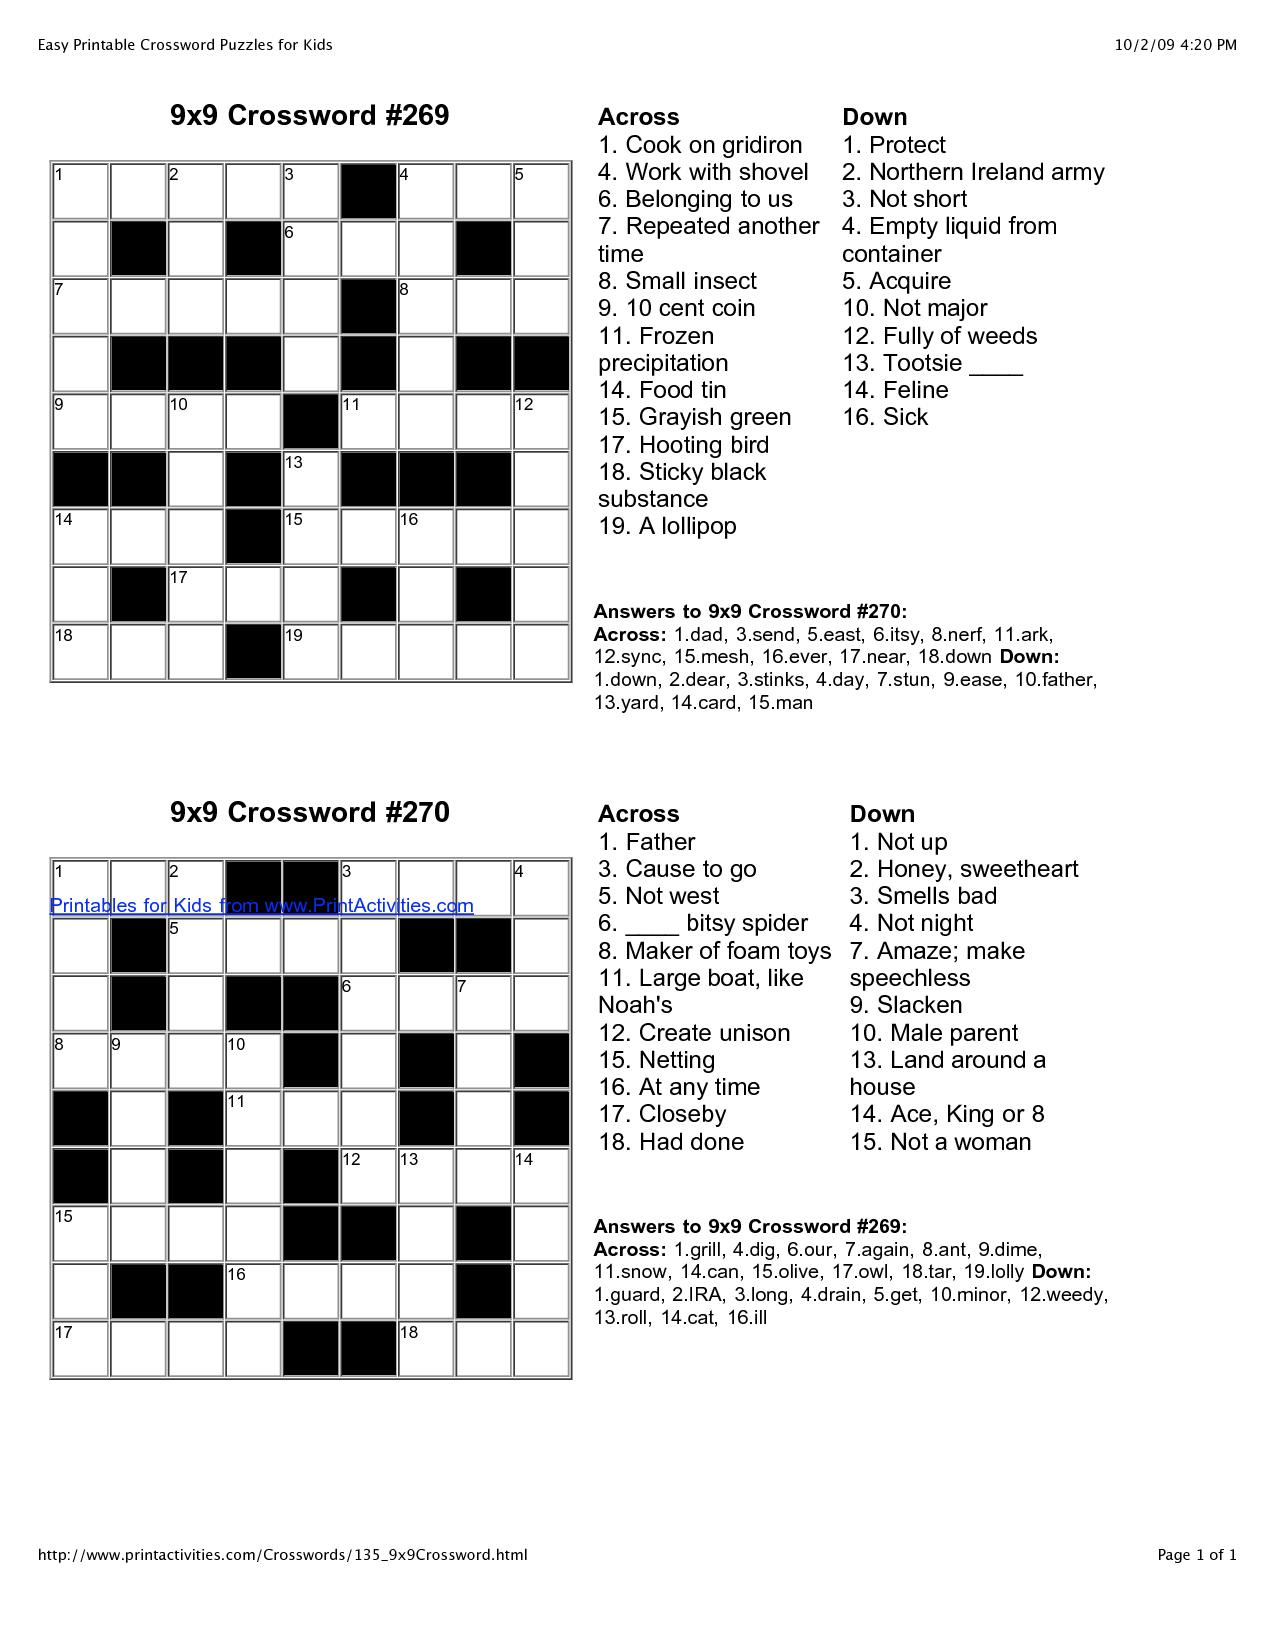 Easy Crossword Puzzles | I'm Going To Be An Slp! | Kids Crossword - Printable Crossword Clue